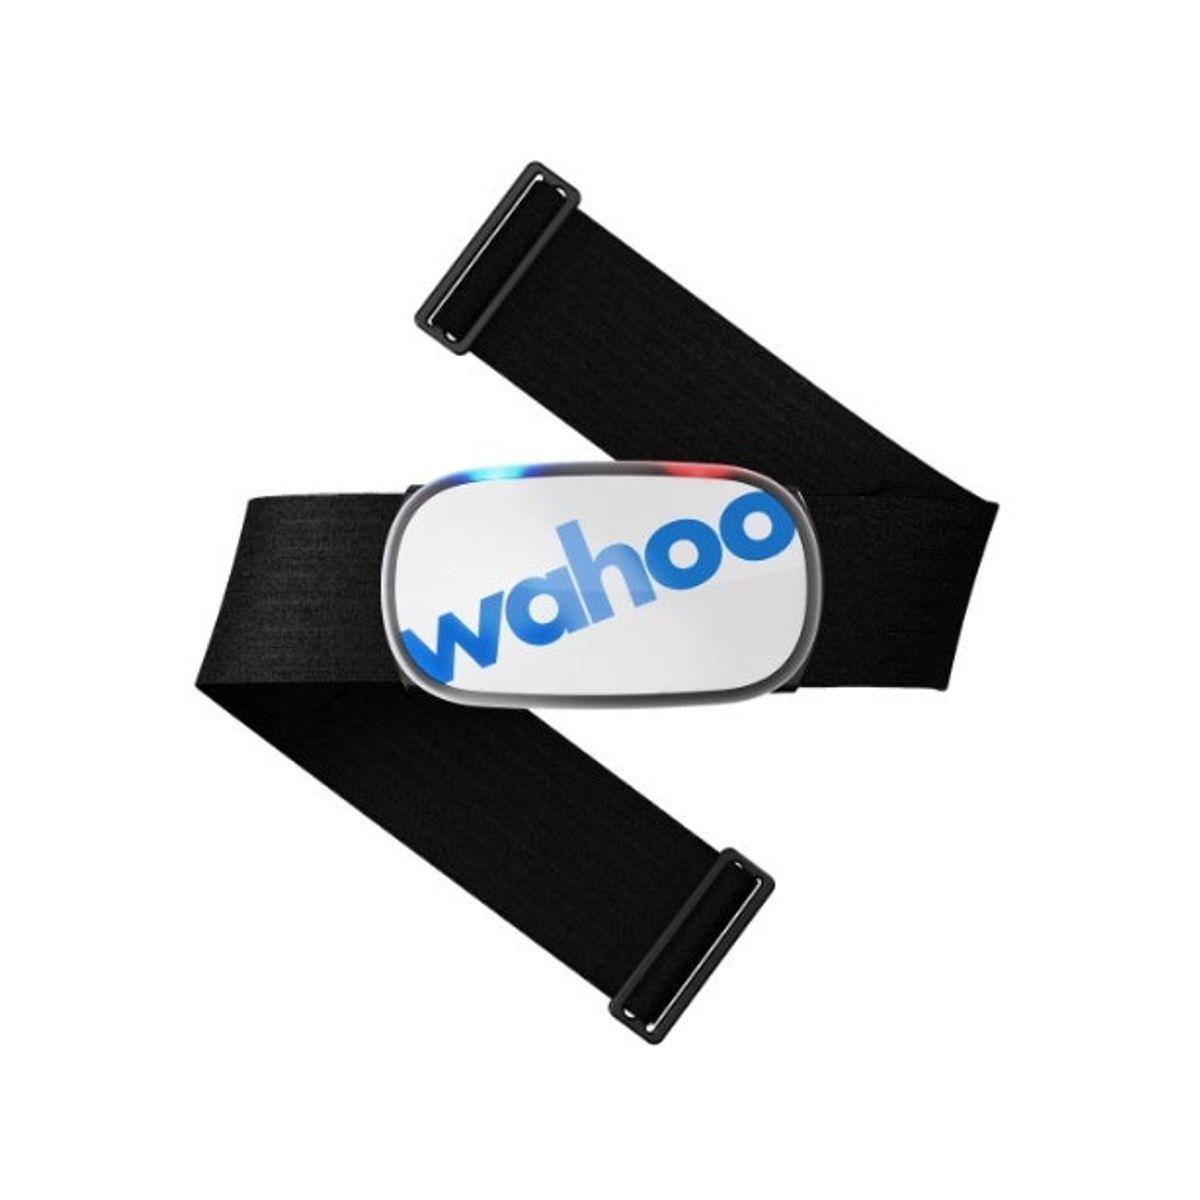 Wahoo tickr white pulsbelte. Svart bånd med hvit pod og blå wahoo logo